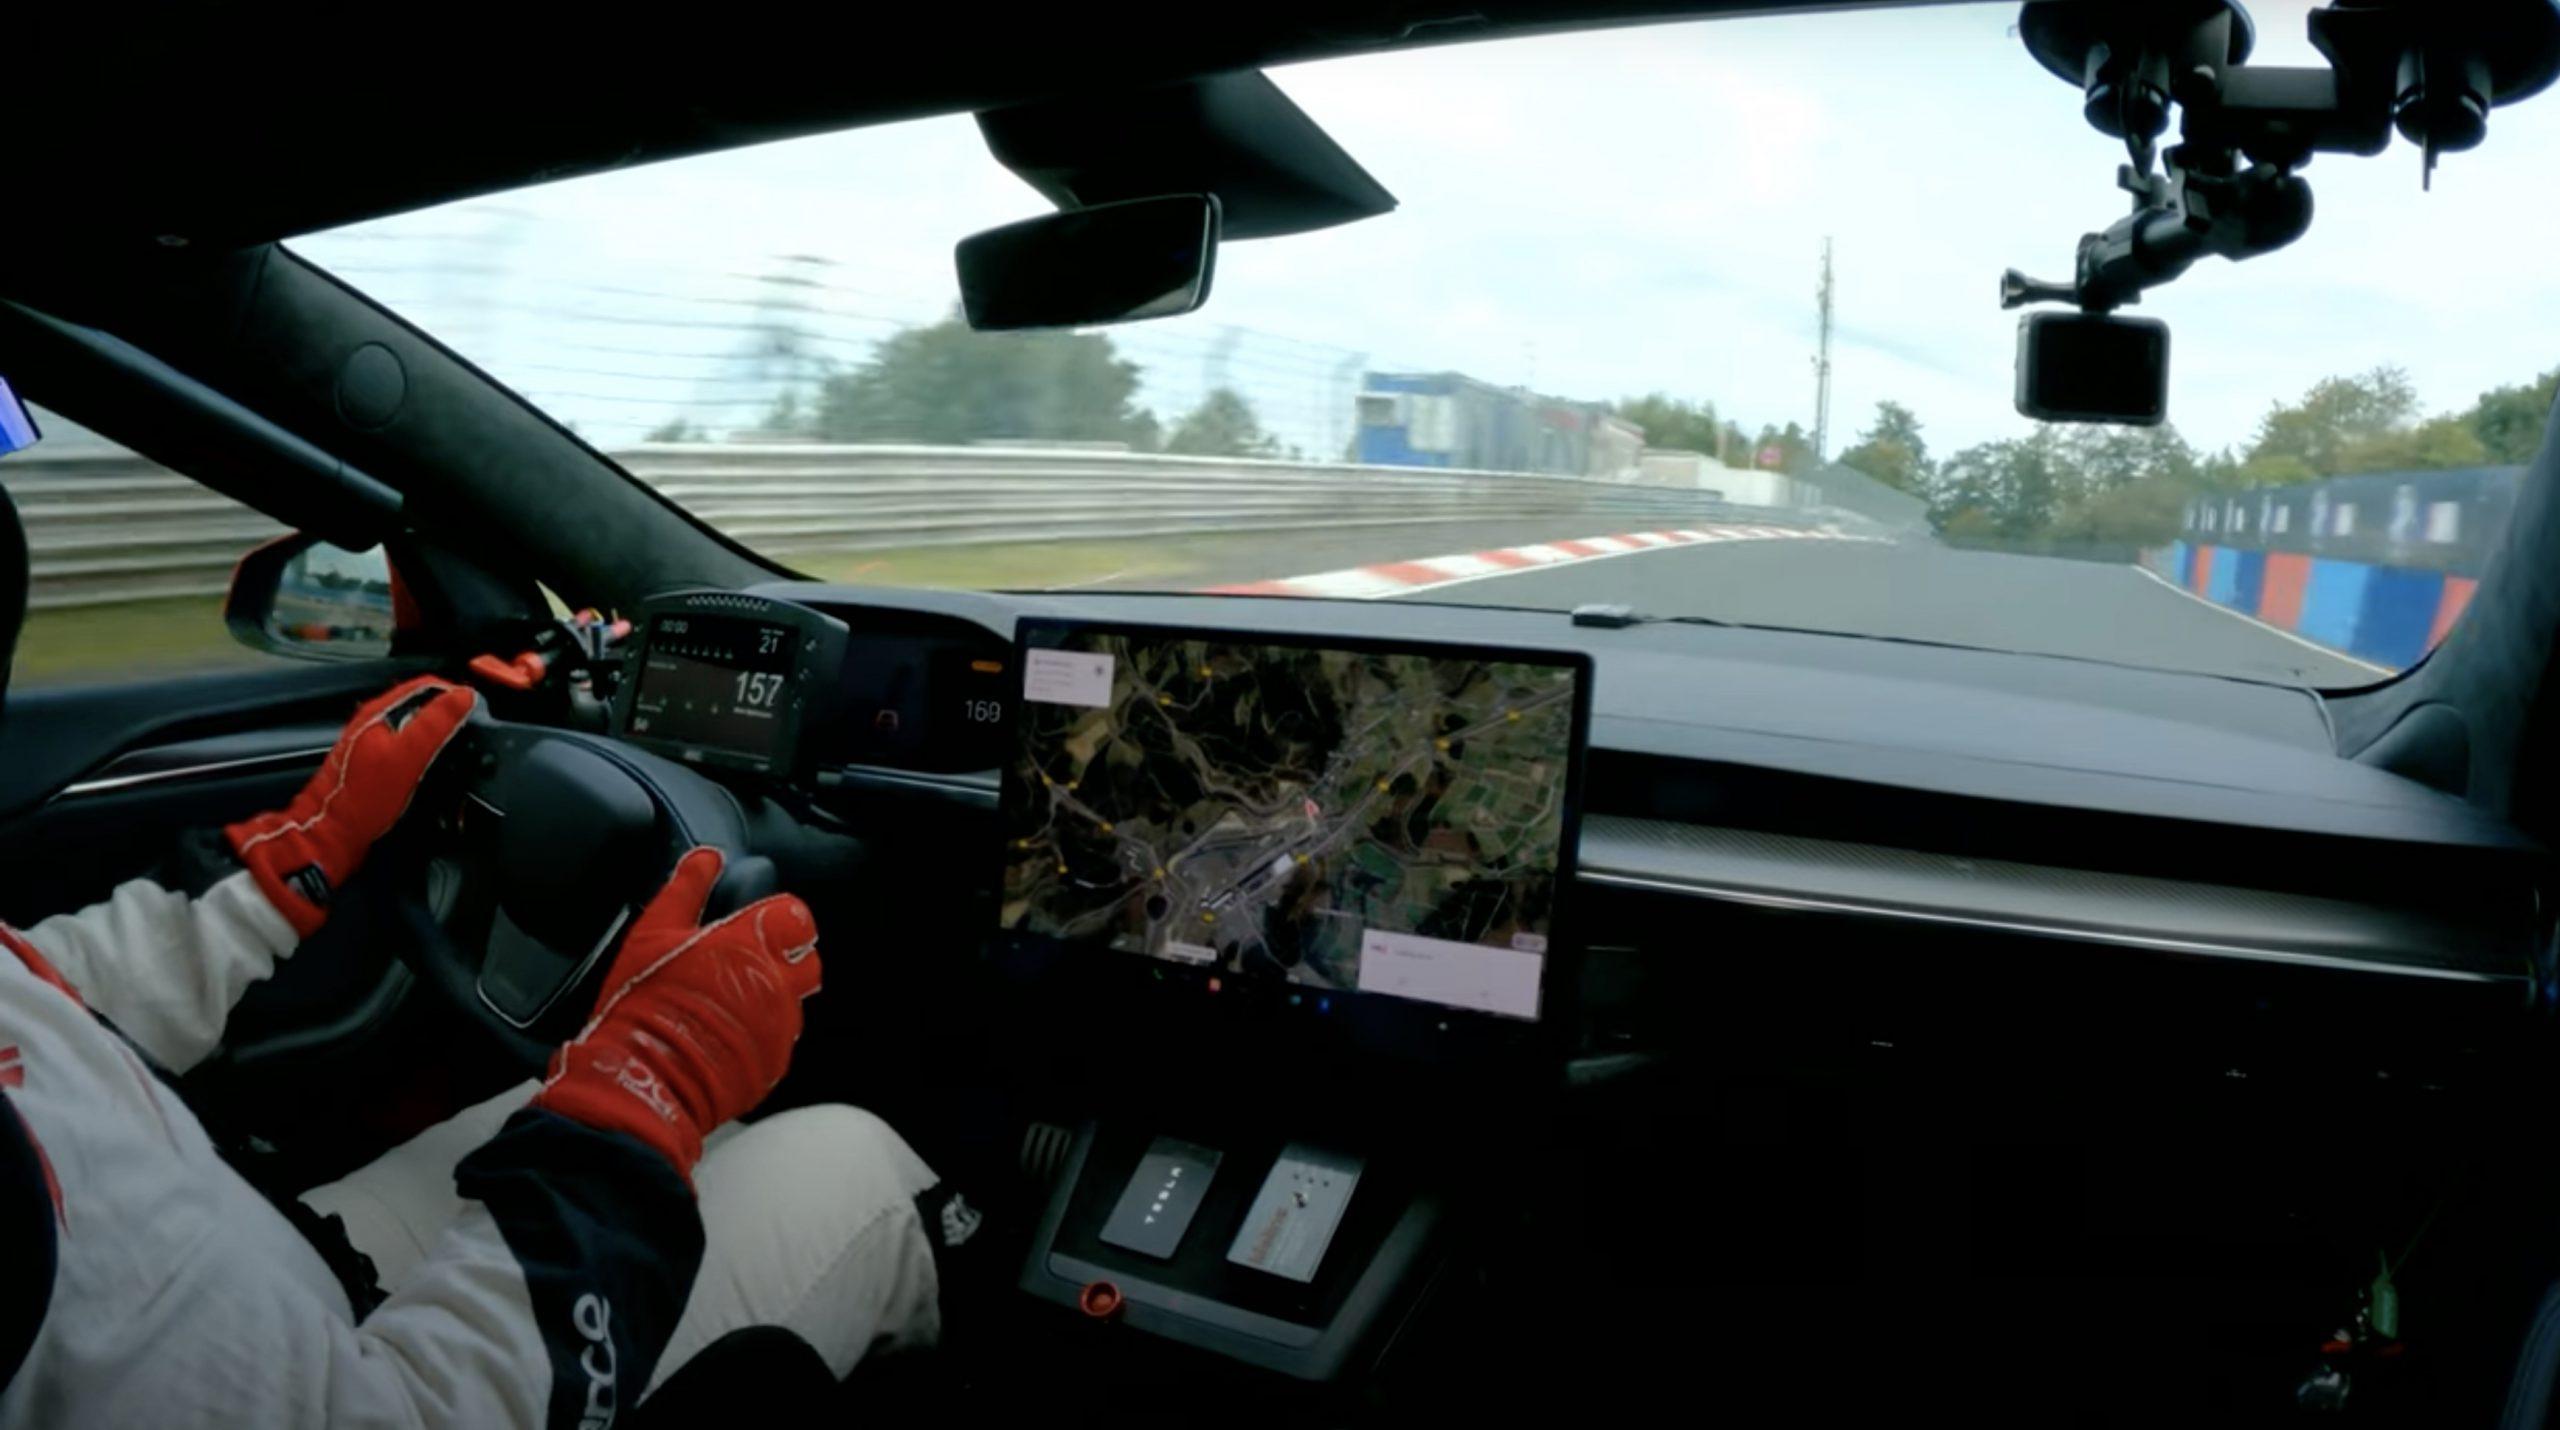 Tesla Model S On Racetrack